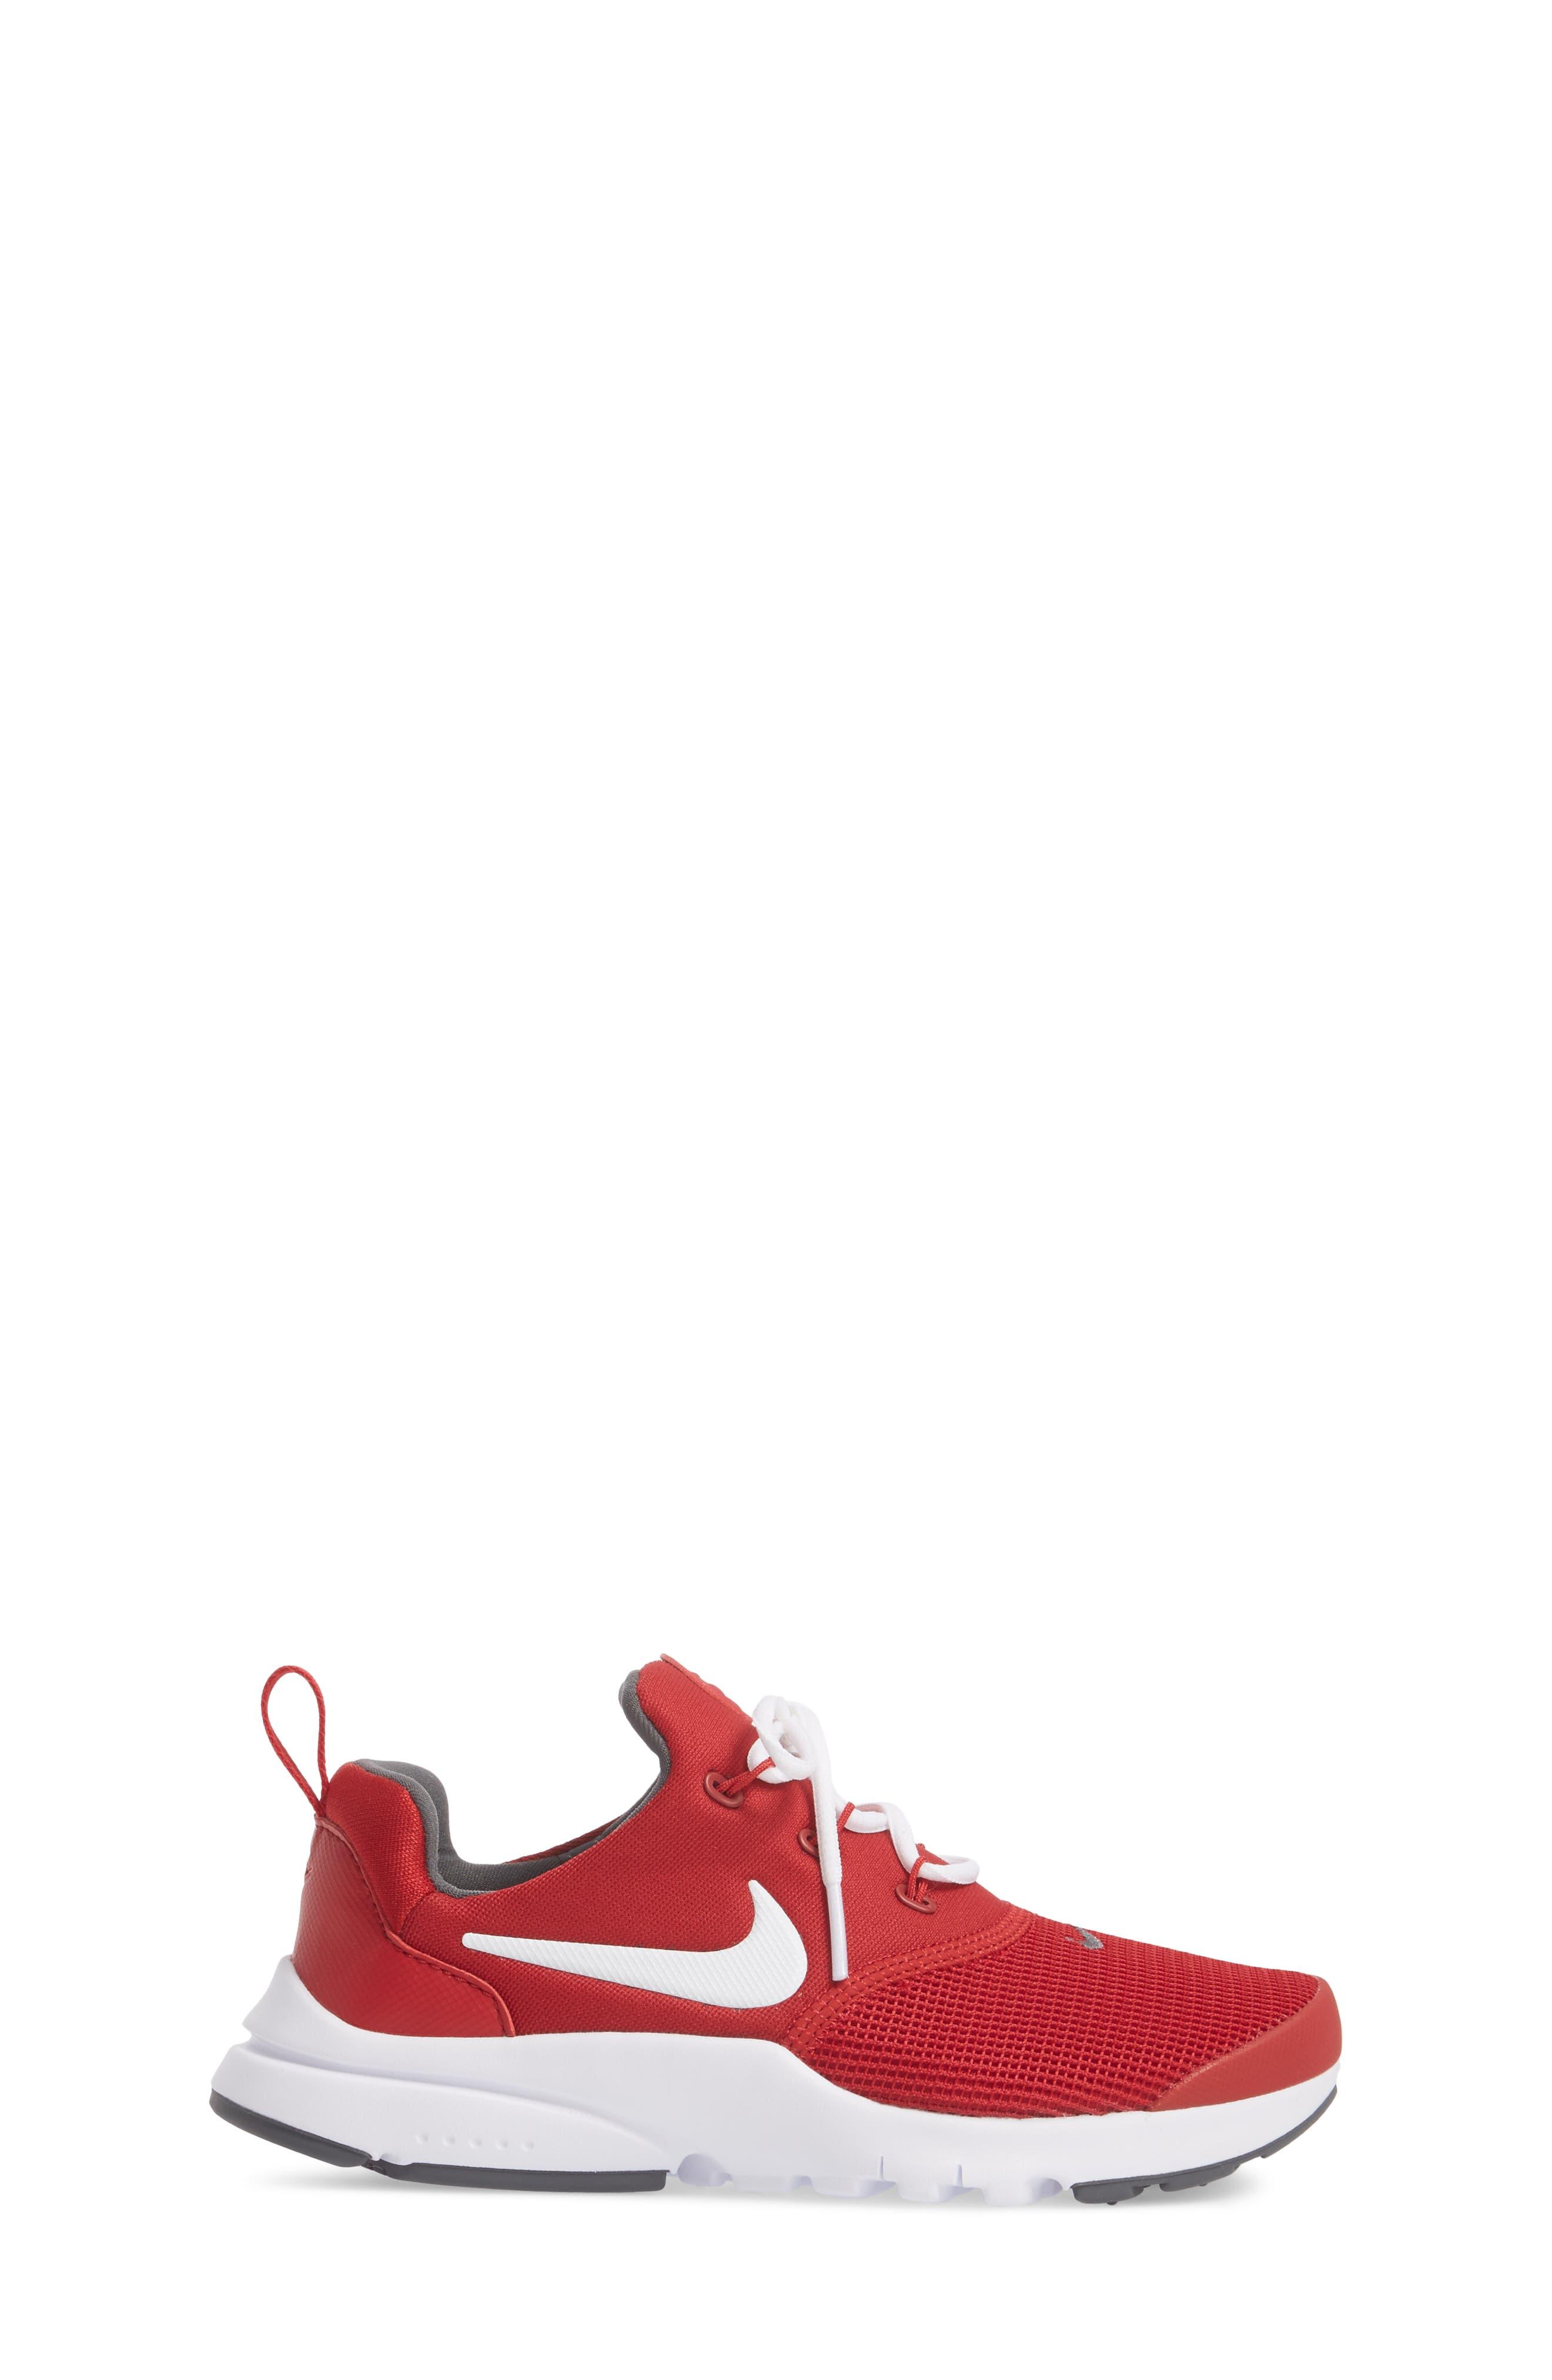 Presto Fly Sneaker,                             Alternate thumbnail 3, color,                             Gym Red/ Dark Grey/ White